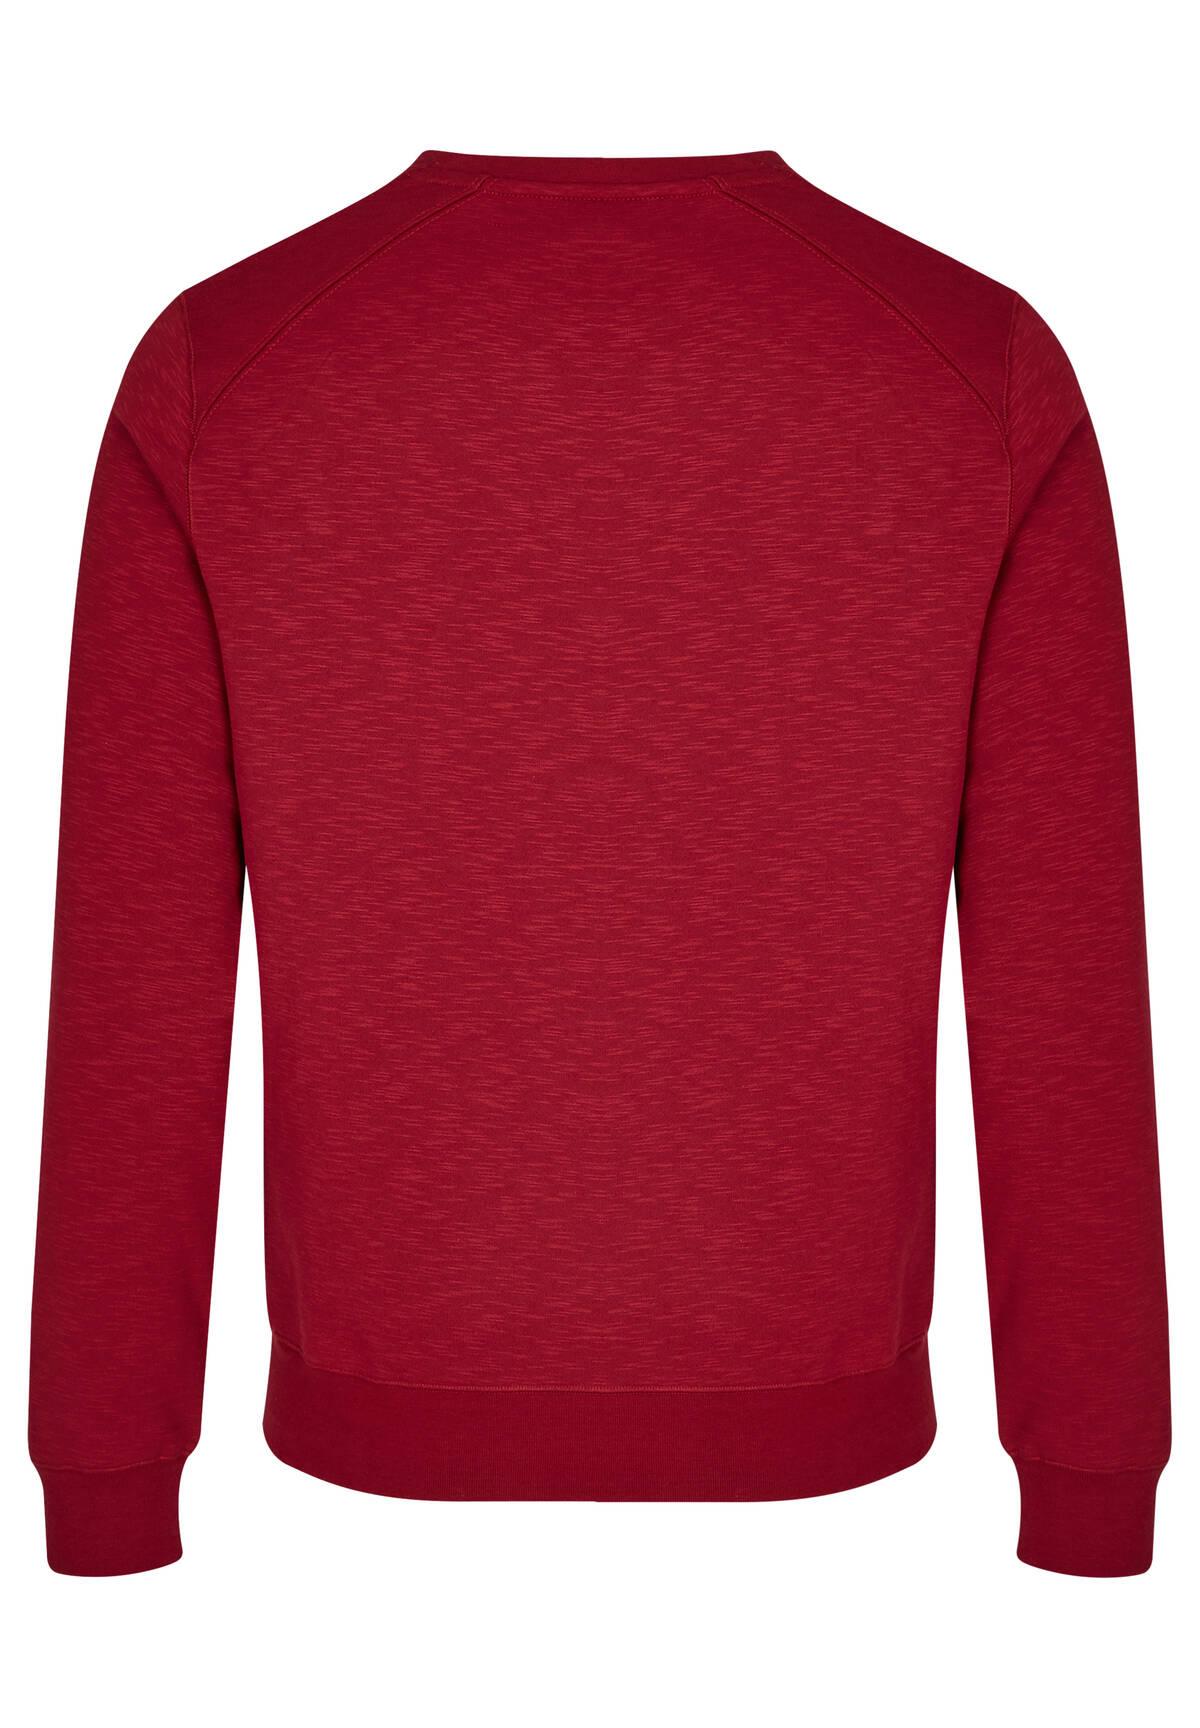 Sweatshirt en coton mélangé /